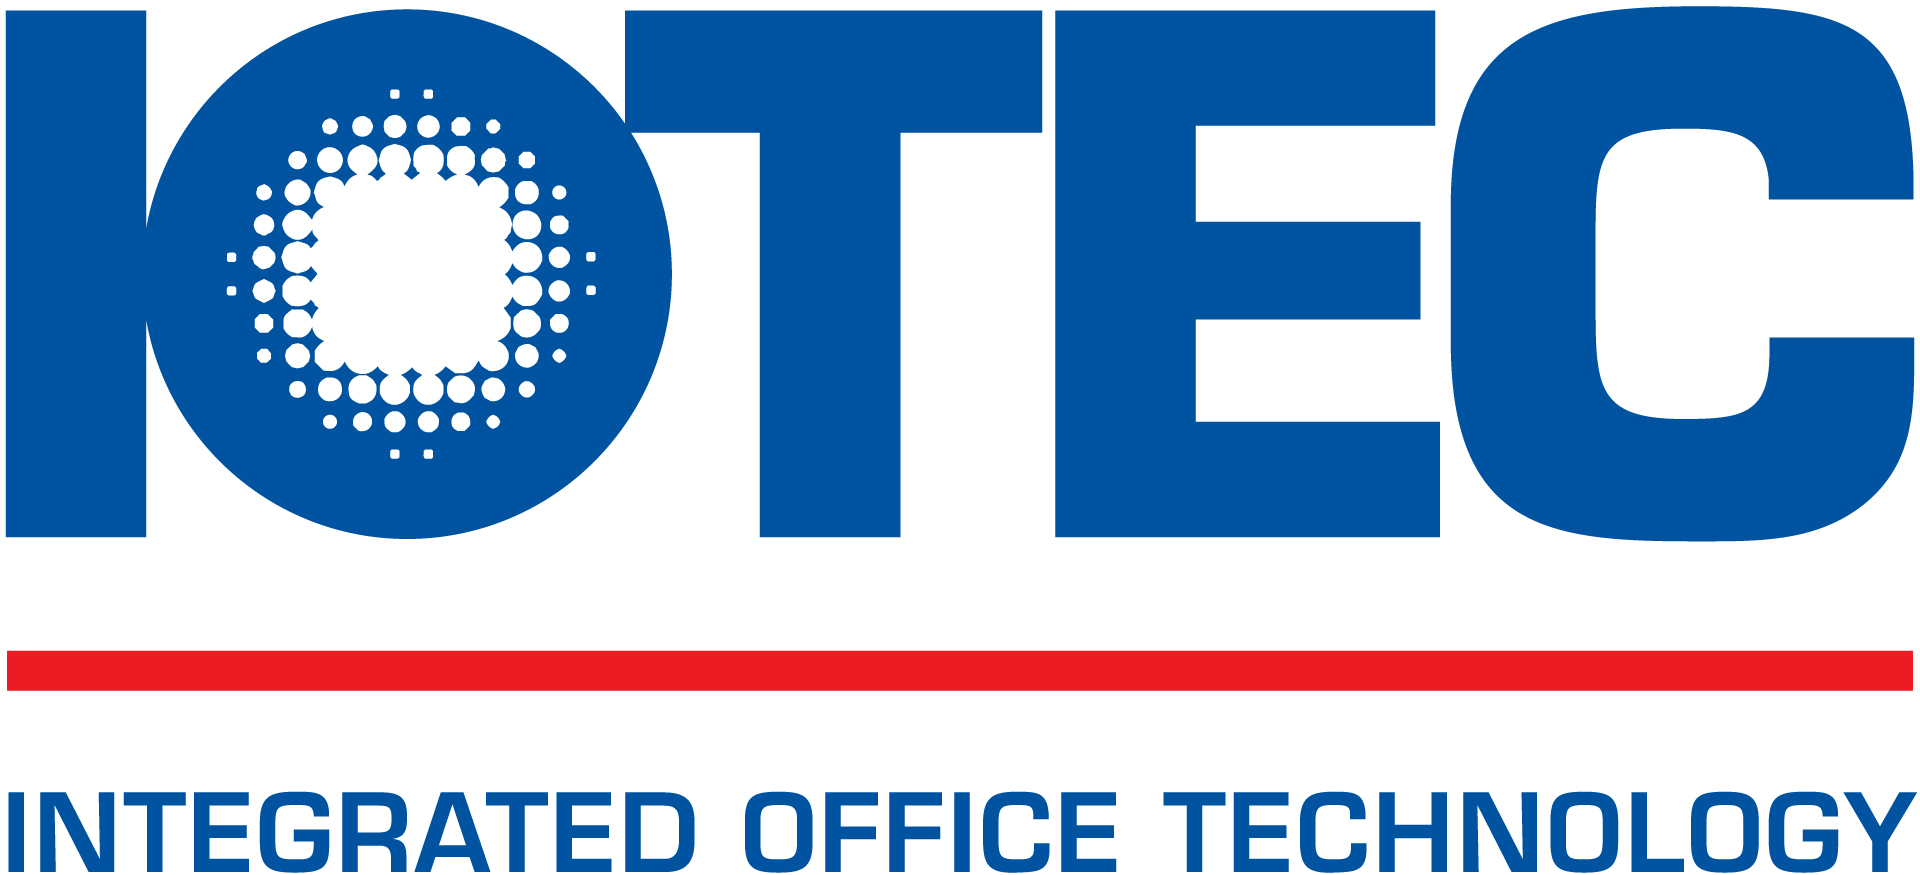 iotec-logo-vector-highres.jpg